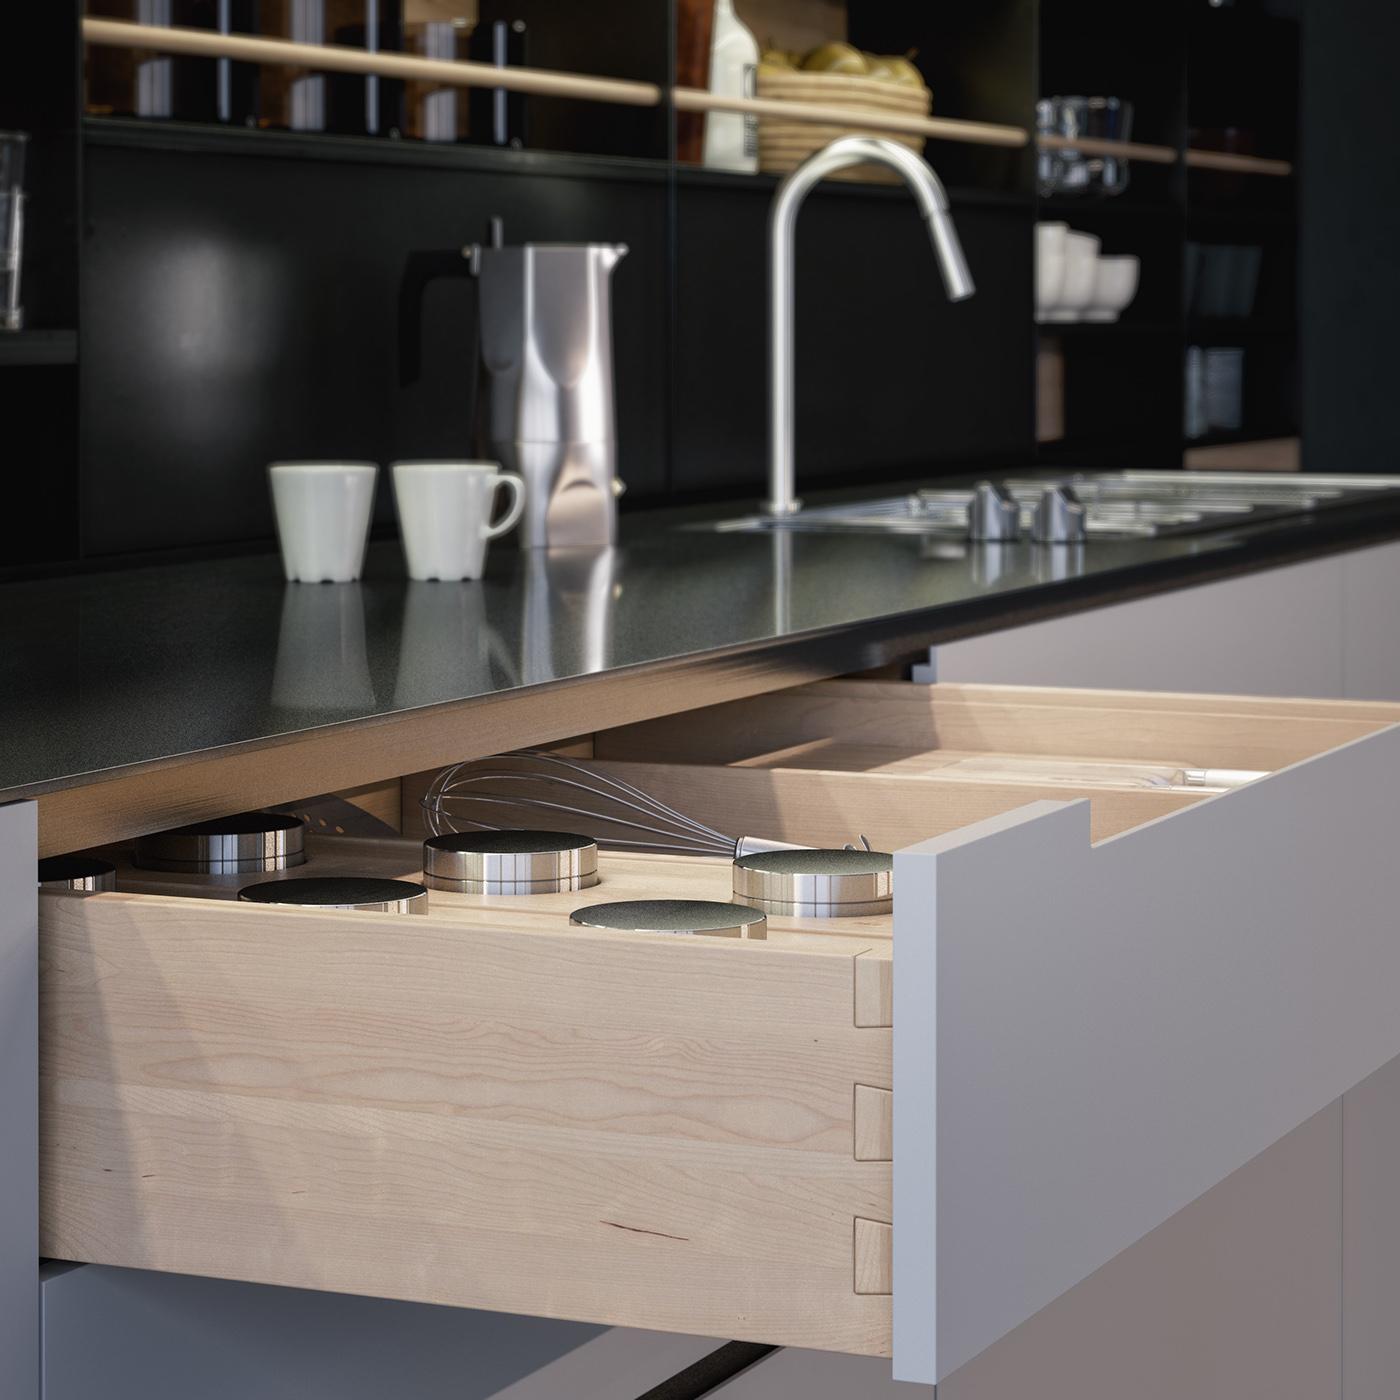 Kitchen CGI HDRI Test On Behance